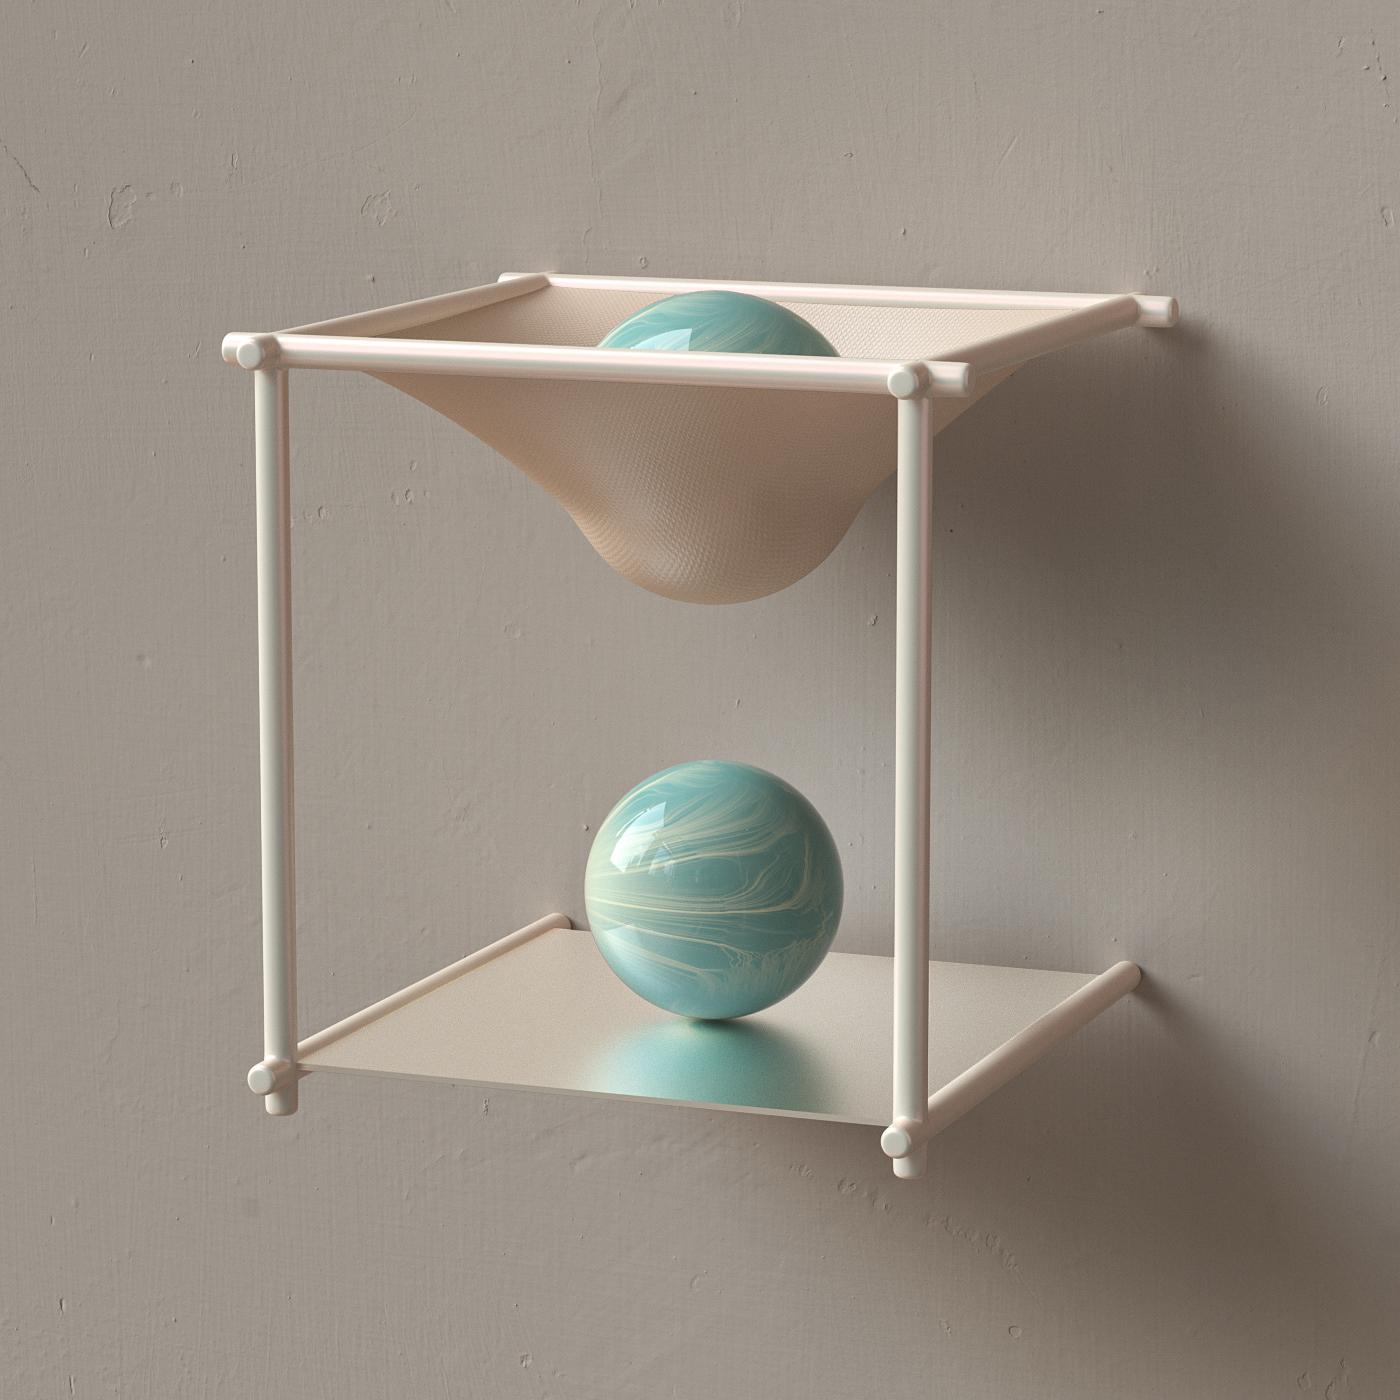 Image may contain: wall, tableware and bowl